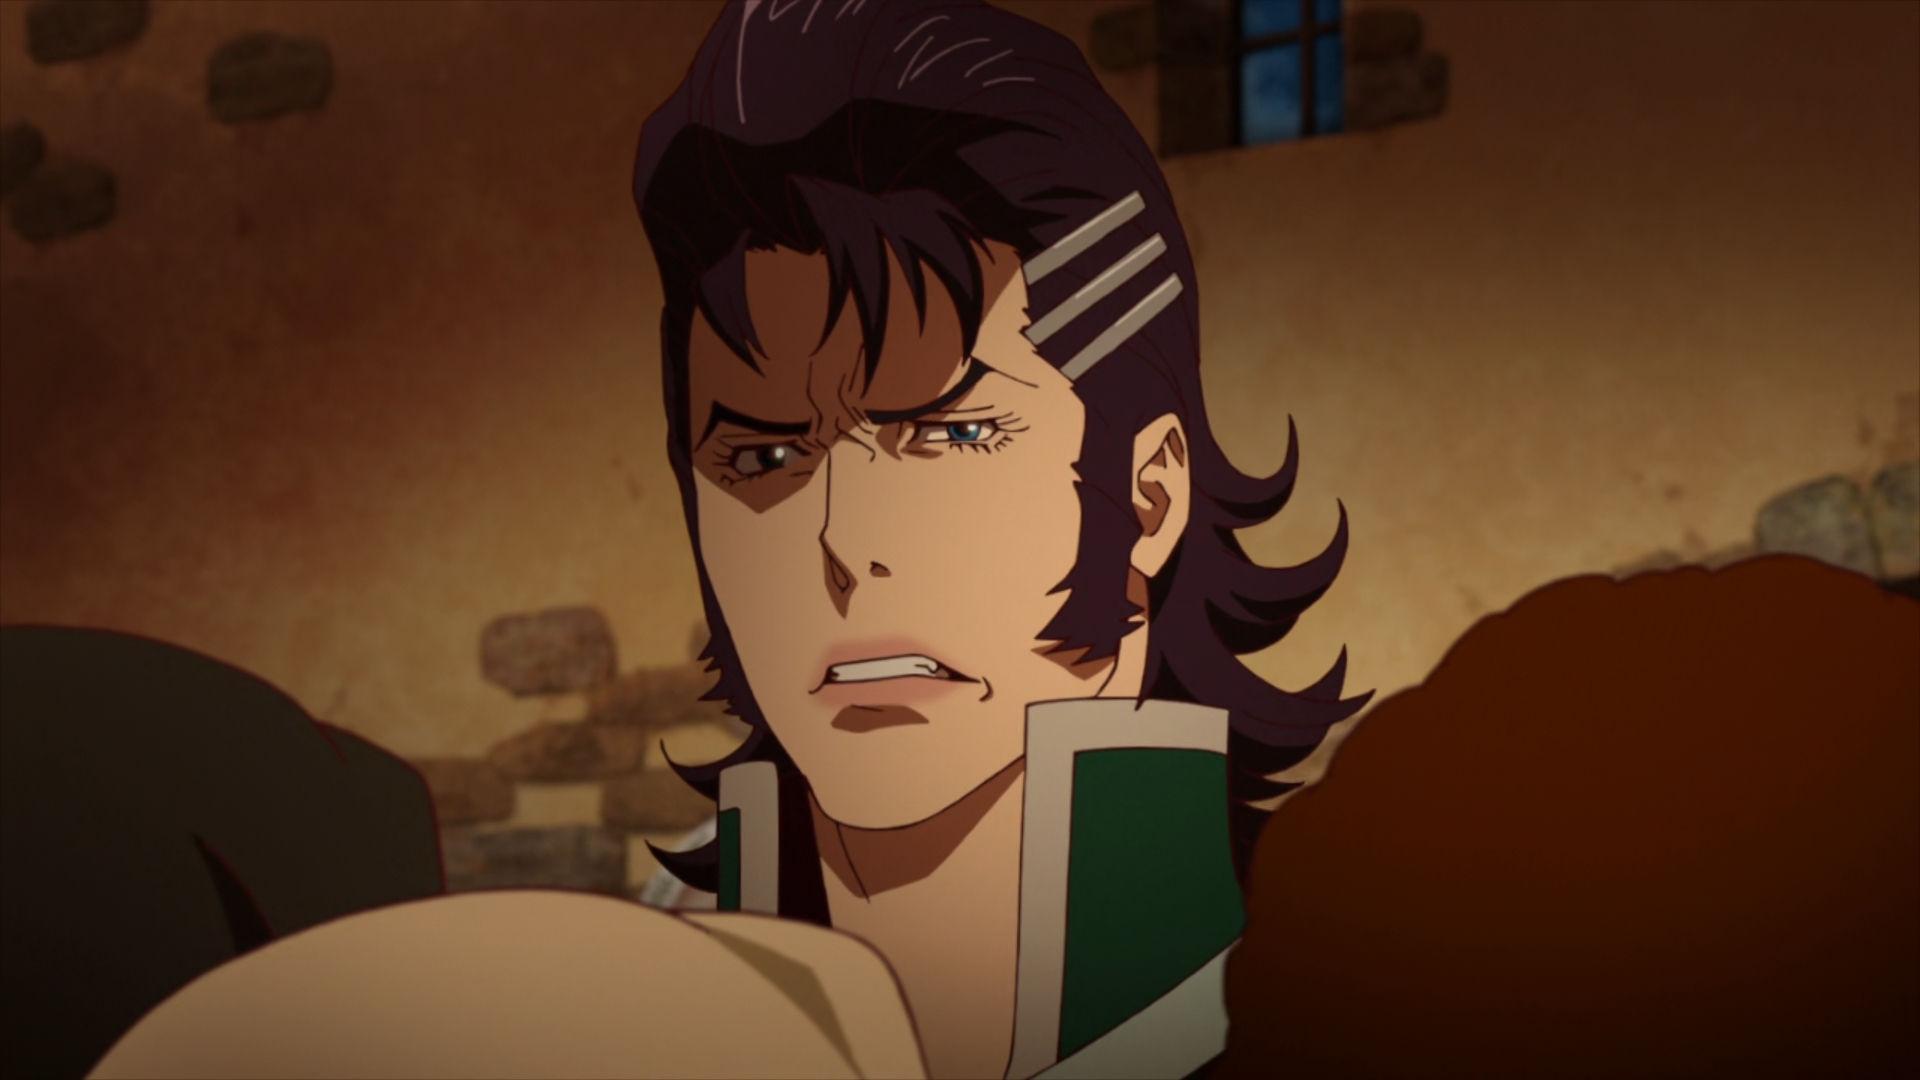 Ярость Бахамута: Генезис / Shingeki no Bahamut: Genesis [S01] (2014/BDRip-HEVC) 1080p, L2